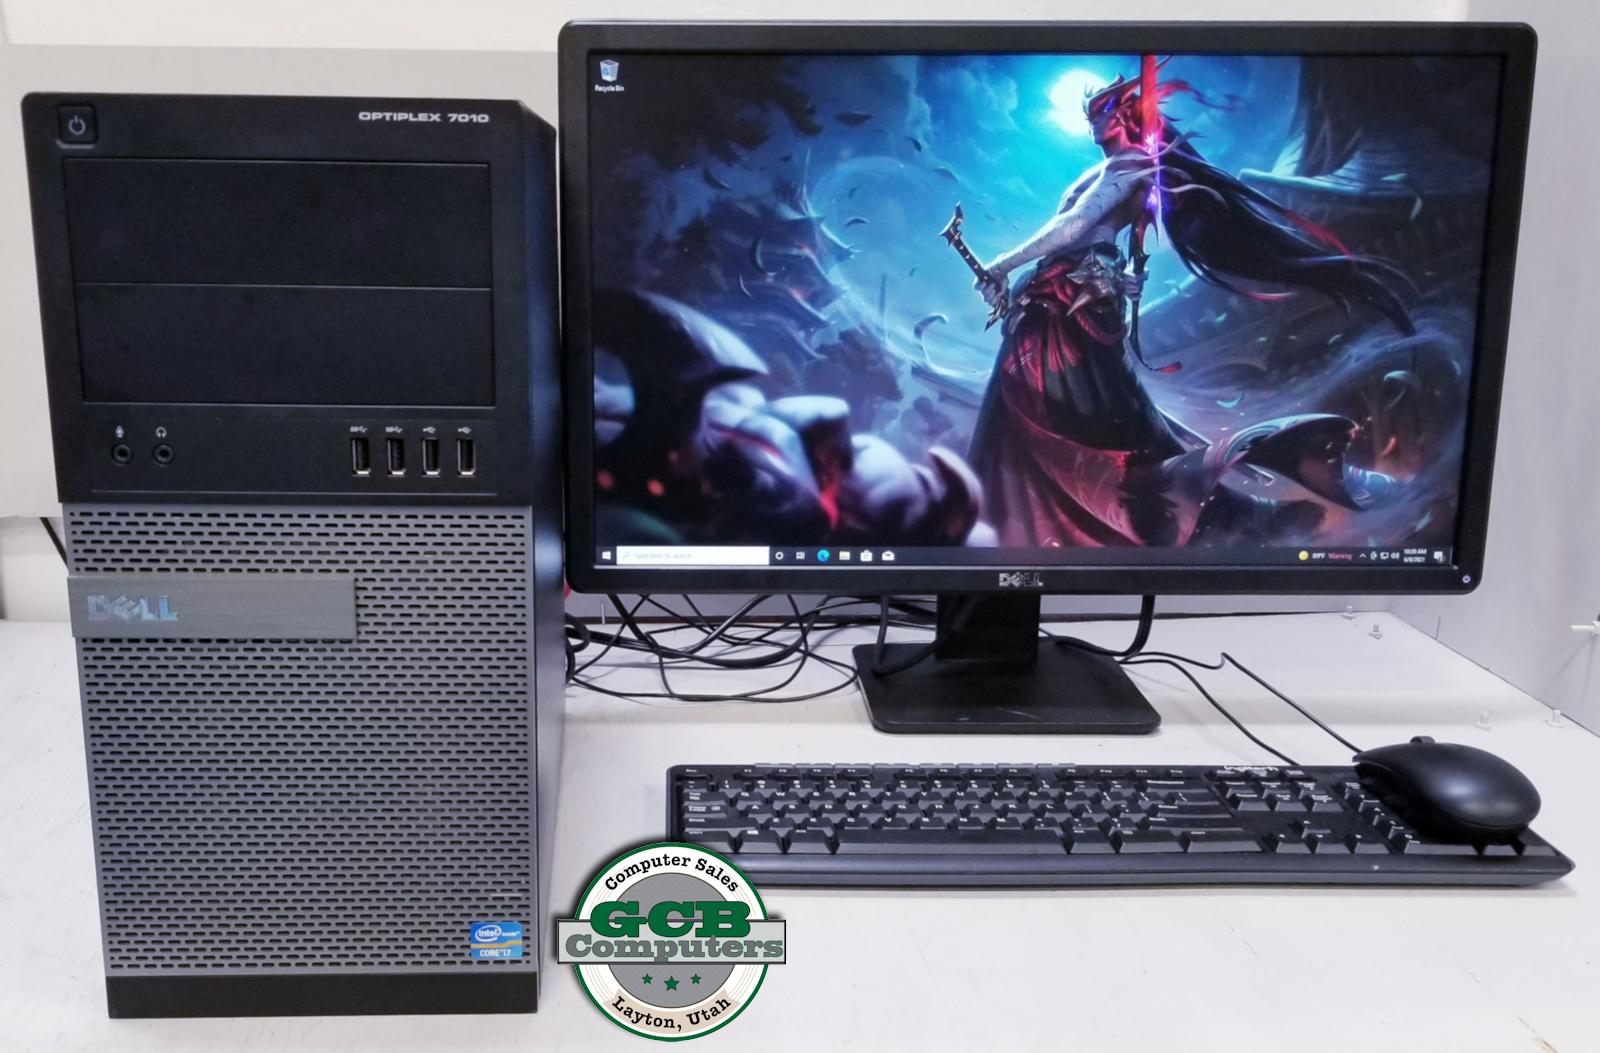 $300 Dell Gamer i7-3770 GTX 750Ti 256GB SSD 2TB HDD 16GB RAM